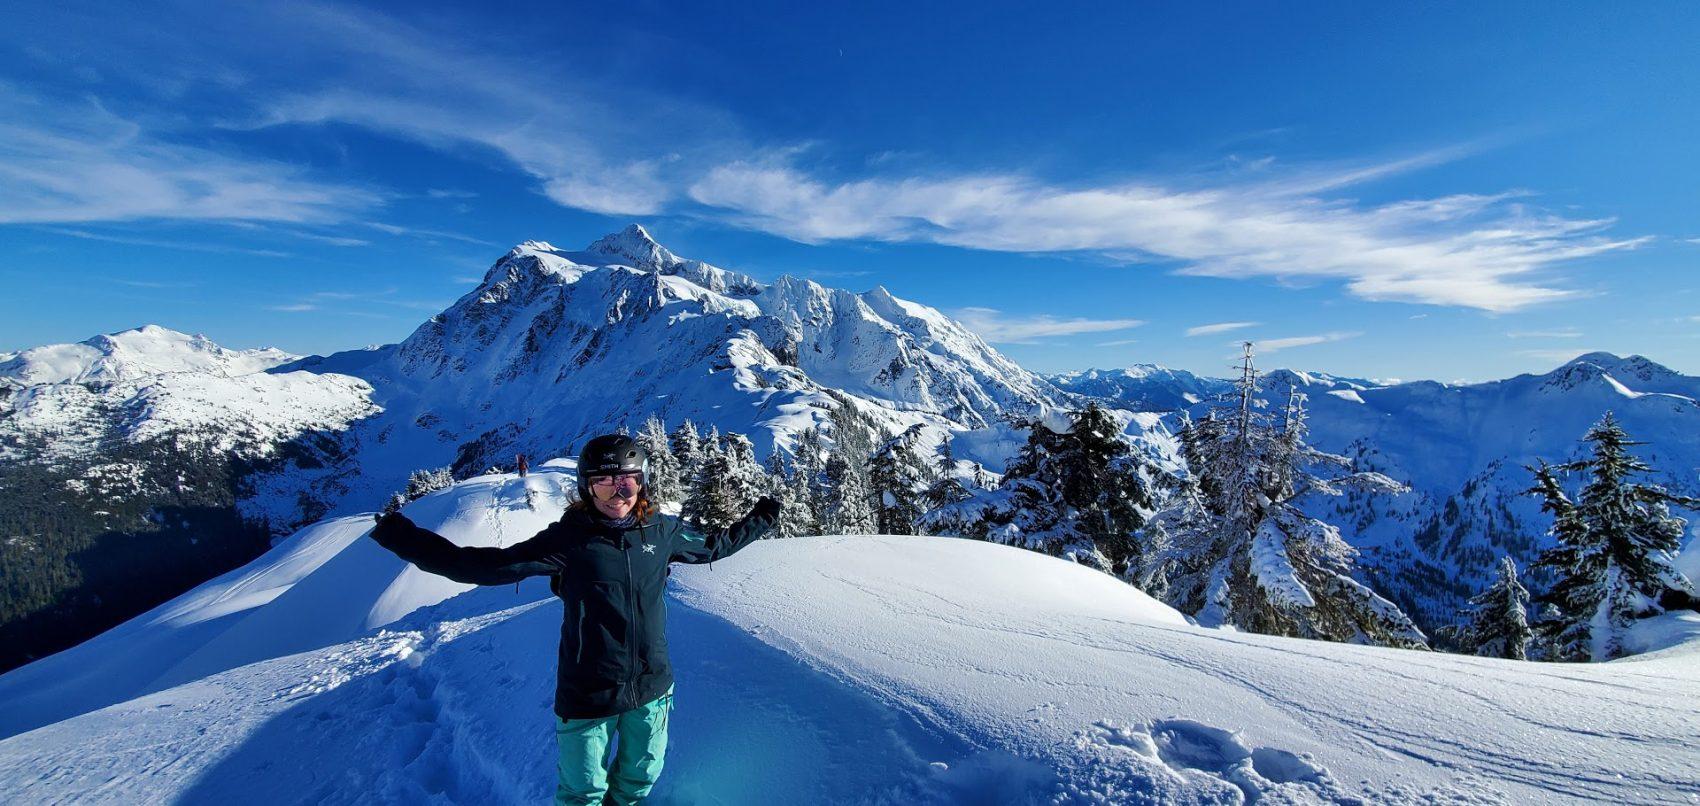 Mt. Shuksan and skier